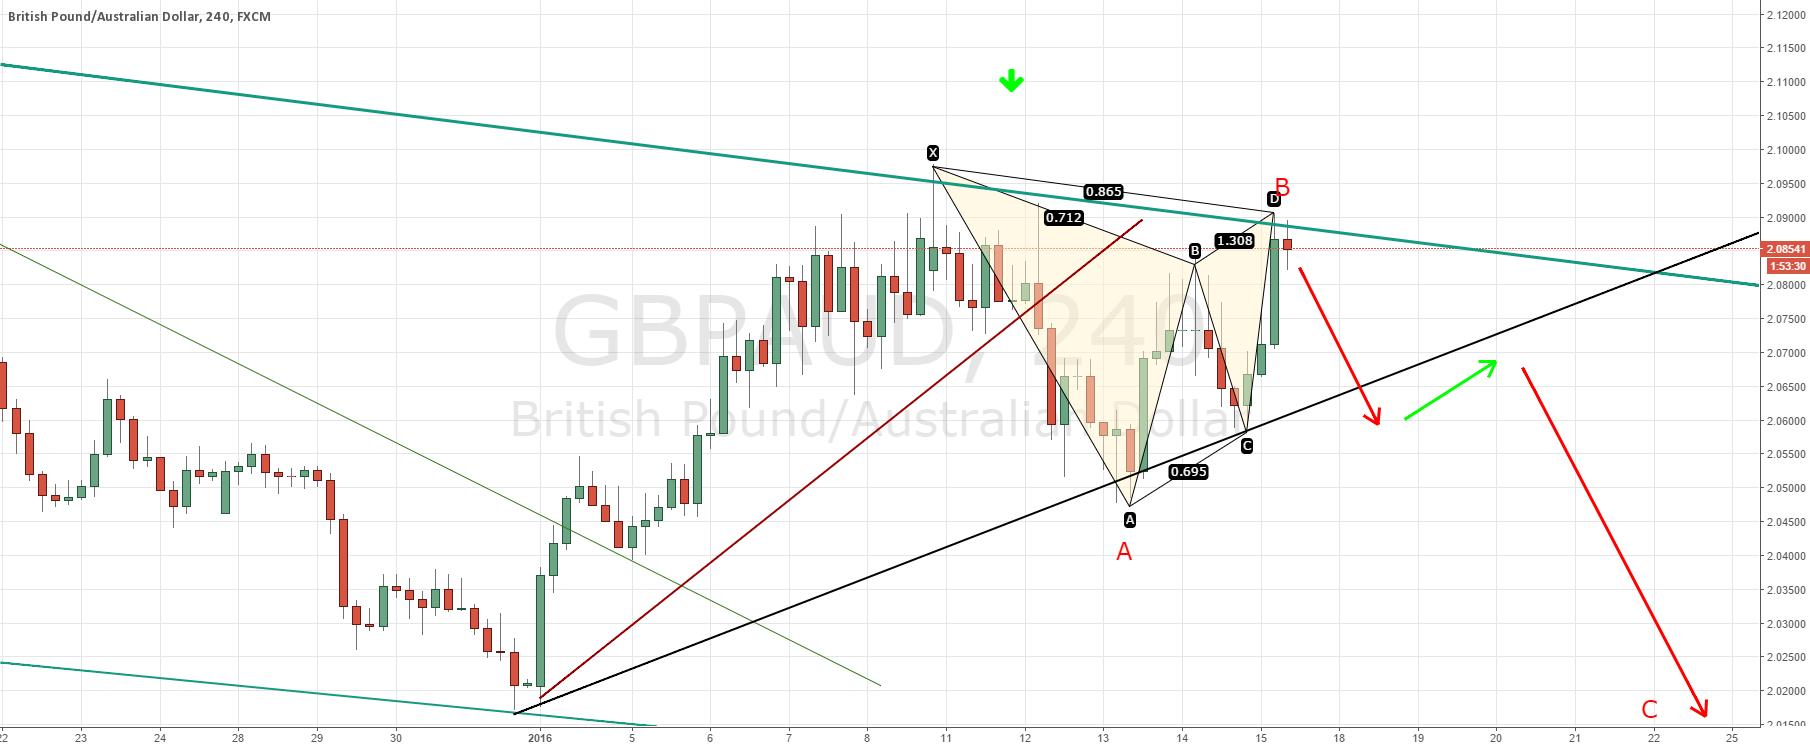 GBPAUD short term short before major move higher